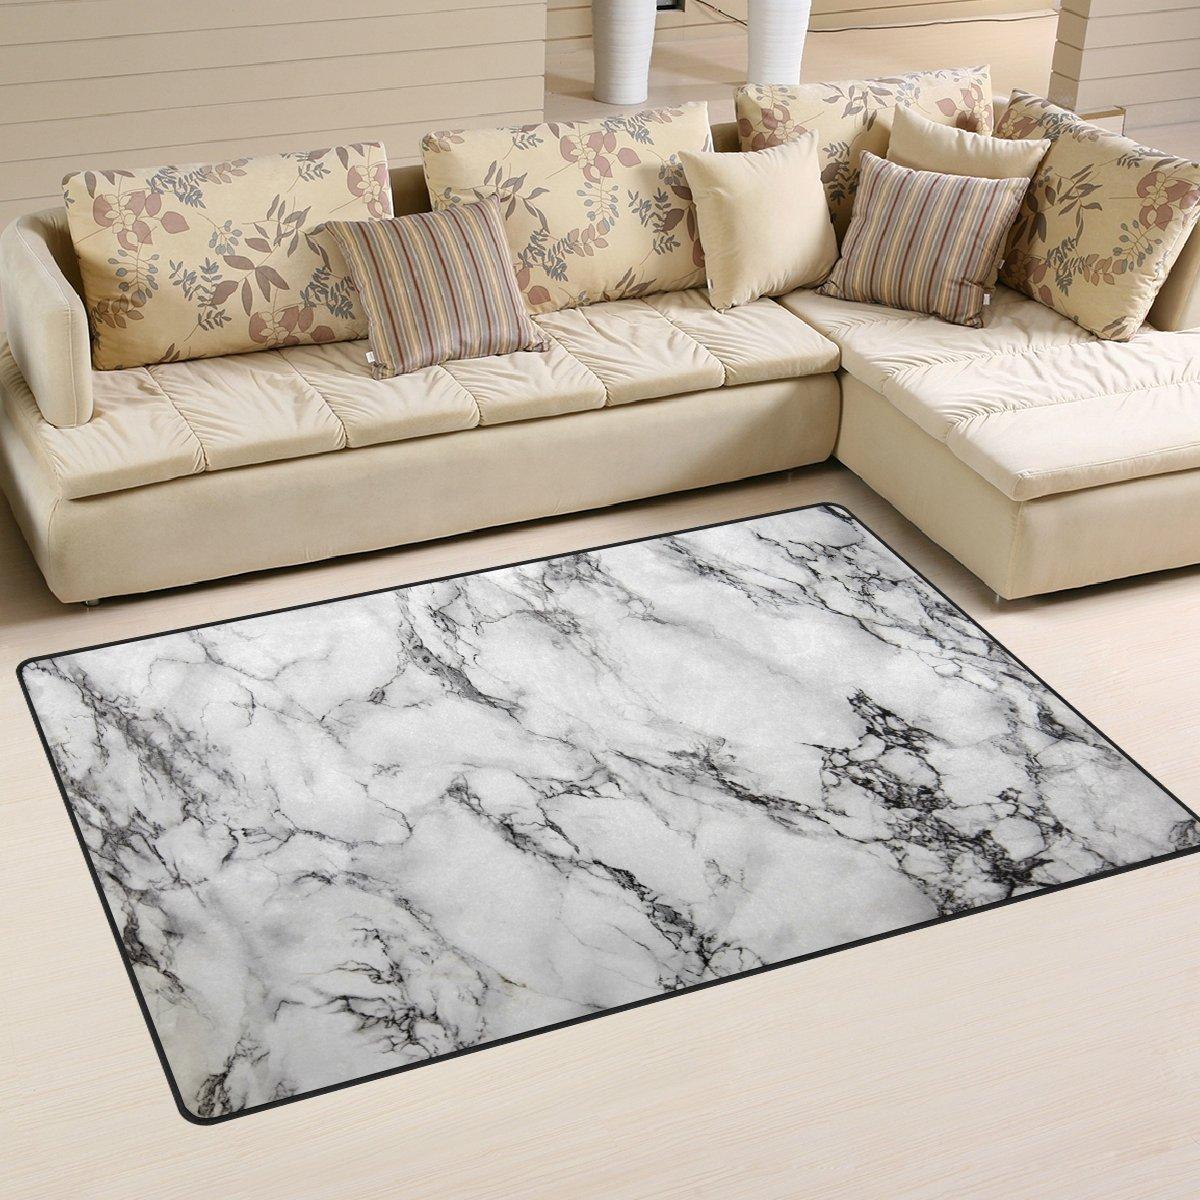 WOZO Hipster Gray Marble Area Rug Rugs Non-Slip Floor Mat Doormats Living Room Bedroom 60 x 39 inches g2489175p146c161s241